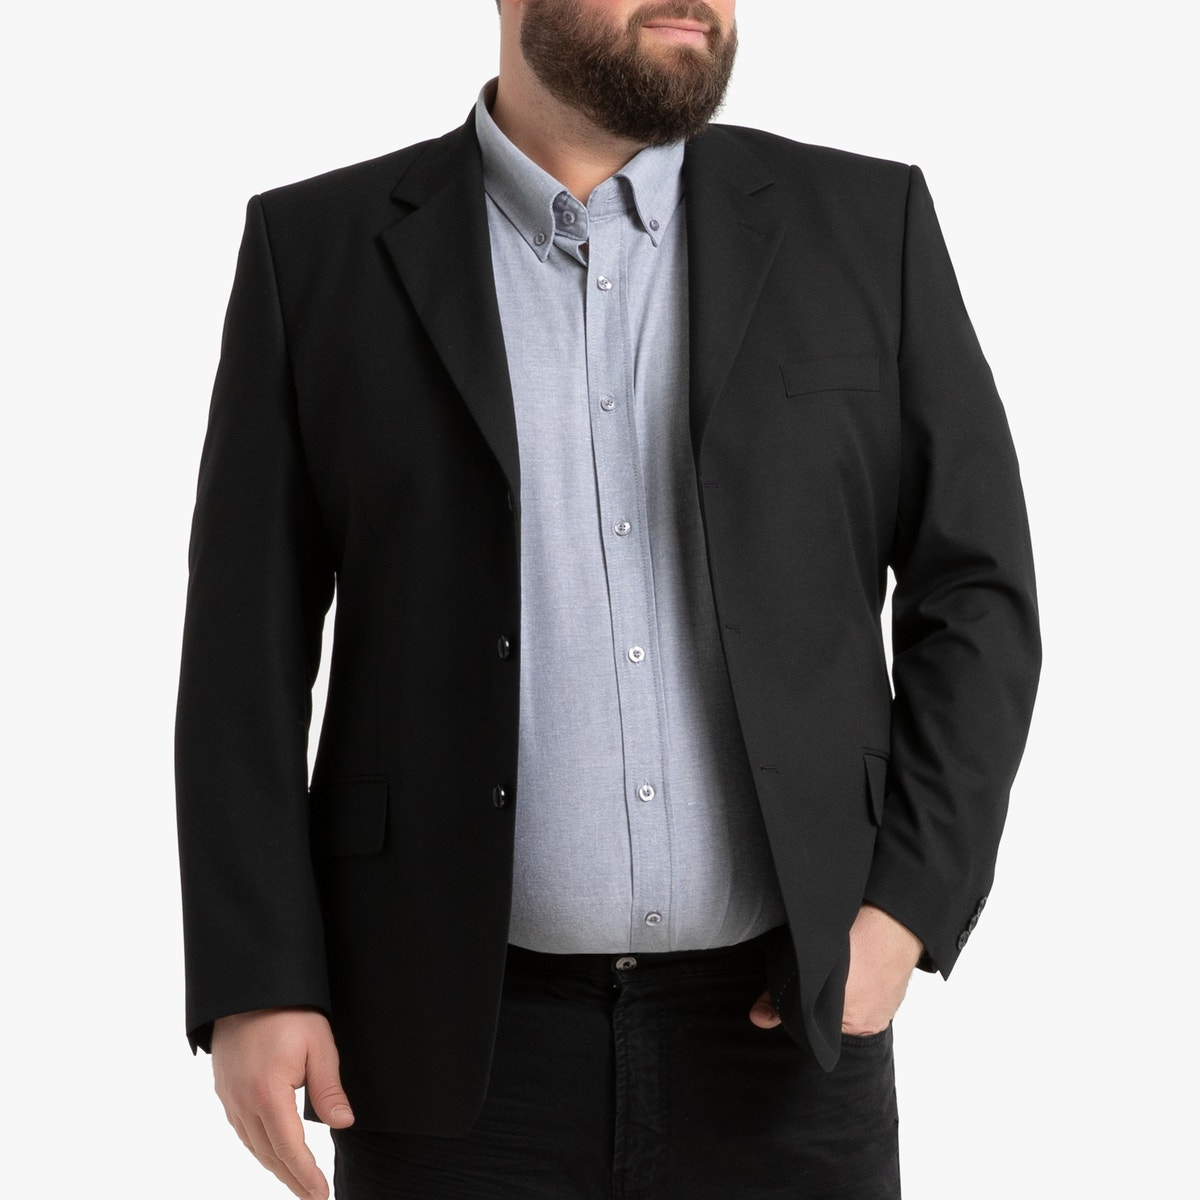 Mπλείζερ κοστουμιού ελαστικό, μήκους 2 ανδρασ   πανωφόρια   σακάκια